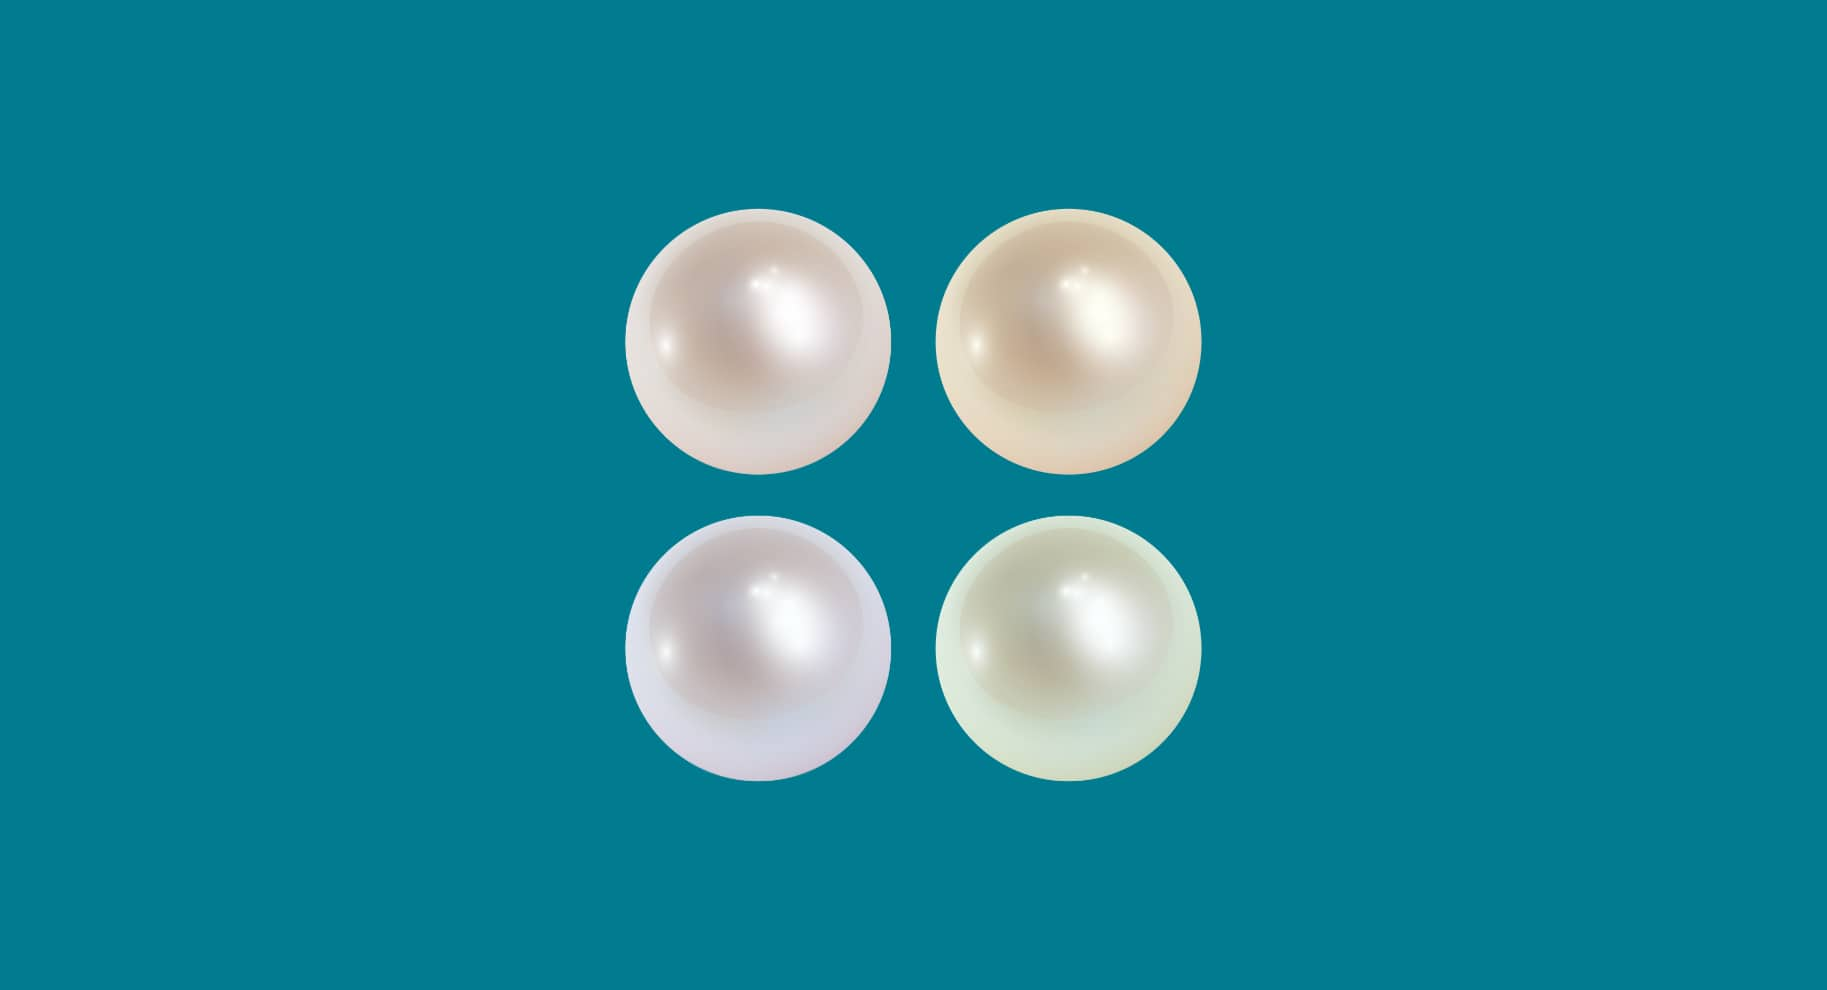 pearl colors illustration